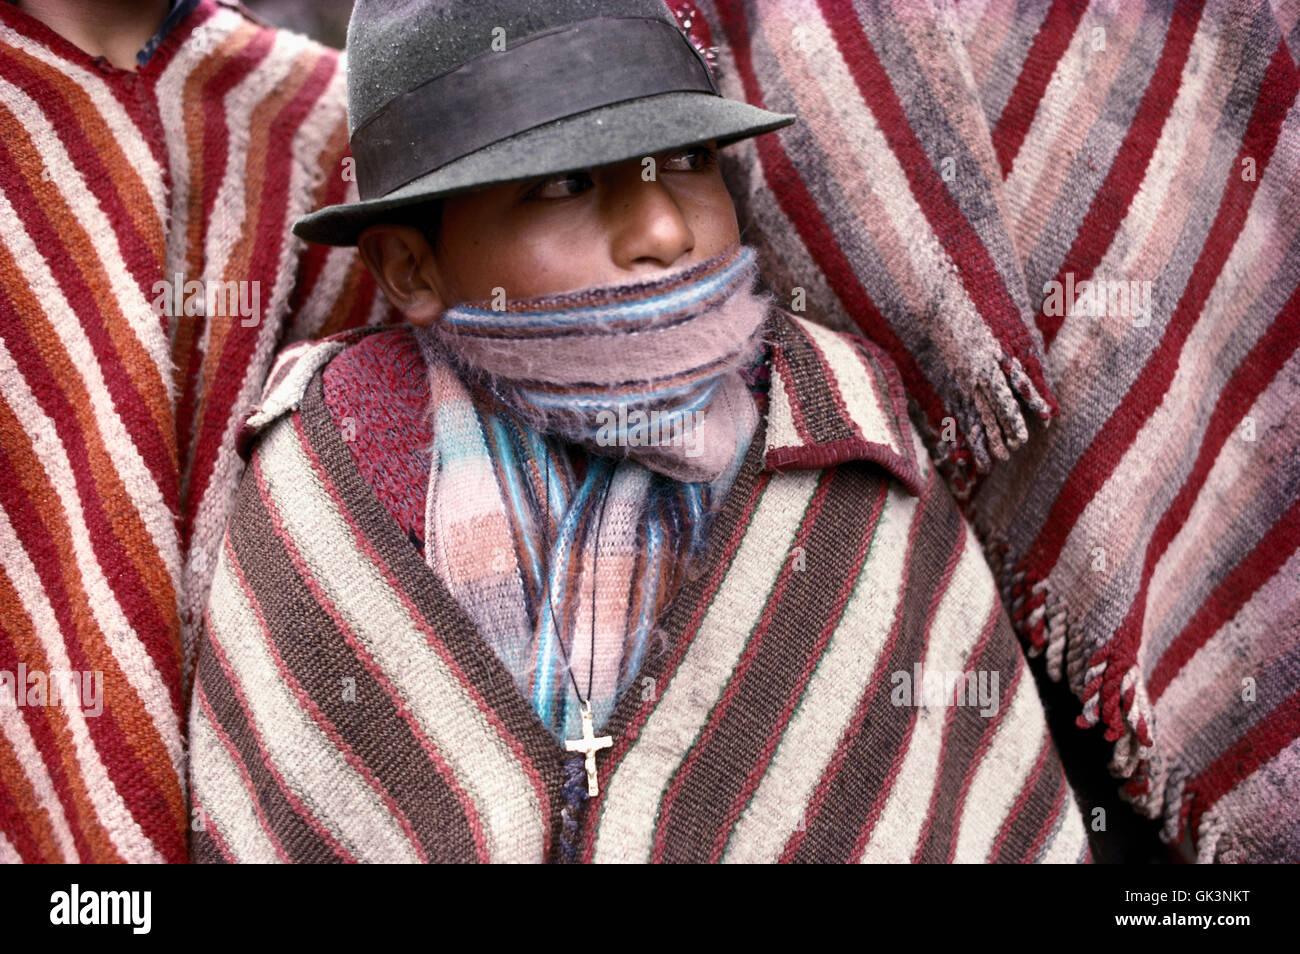 Quechua Boy Imágenes De Stock   Quechua Boy Fotos De Stock - Alamy beb2ea9bee2